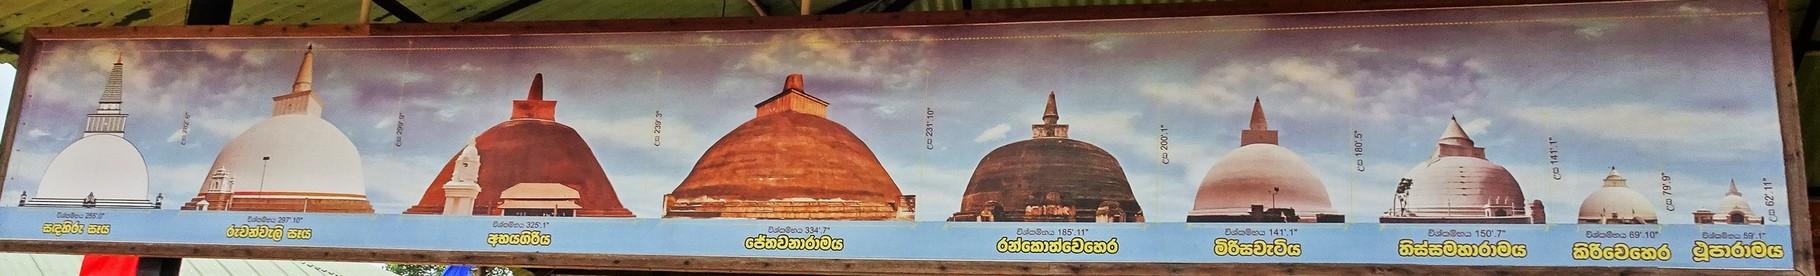 Die verschiedenen Stupas.